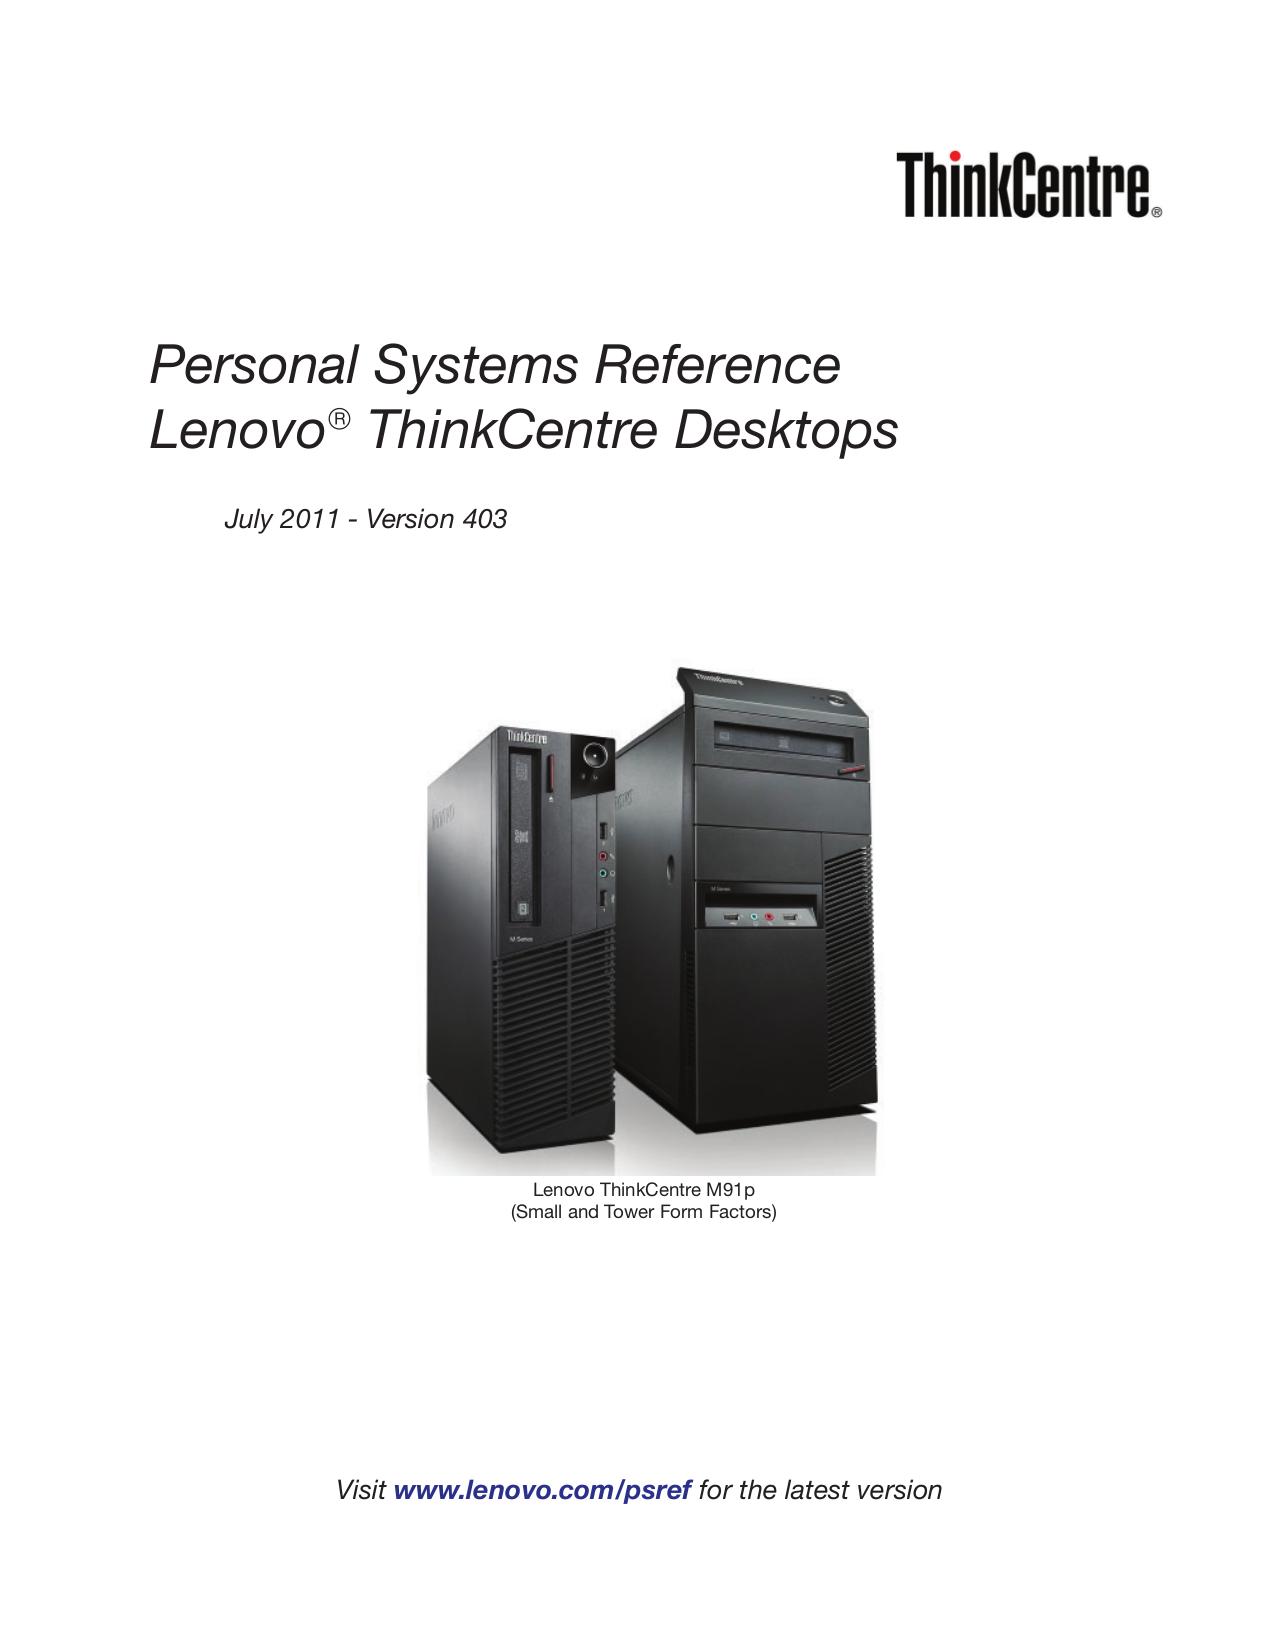 pdf for Lenovo Desktop ThinkCentre M58 7639 manual